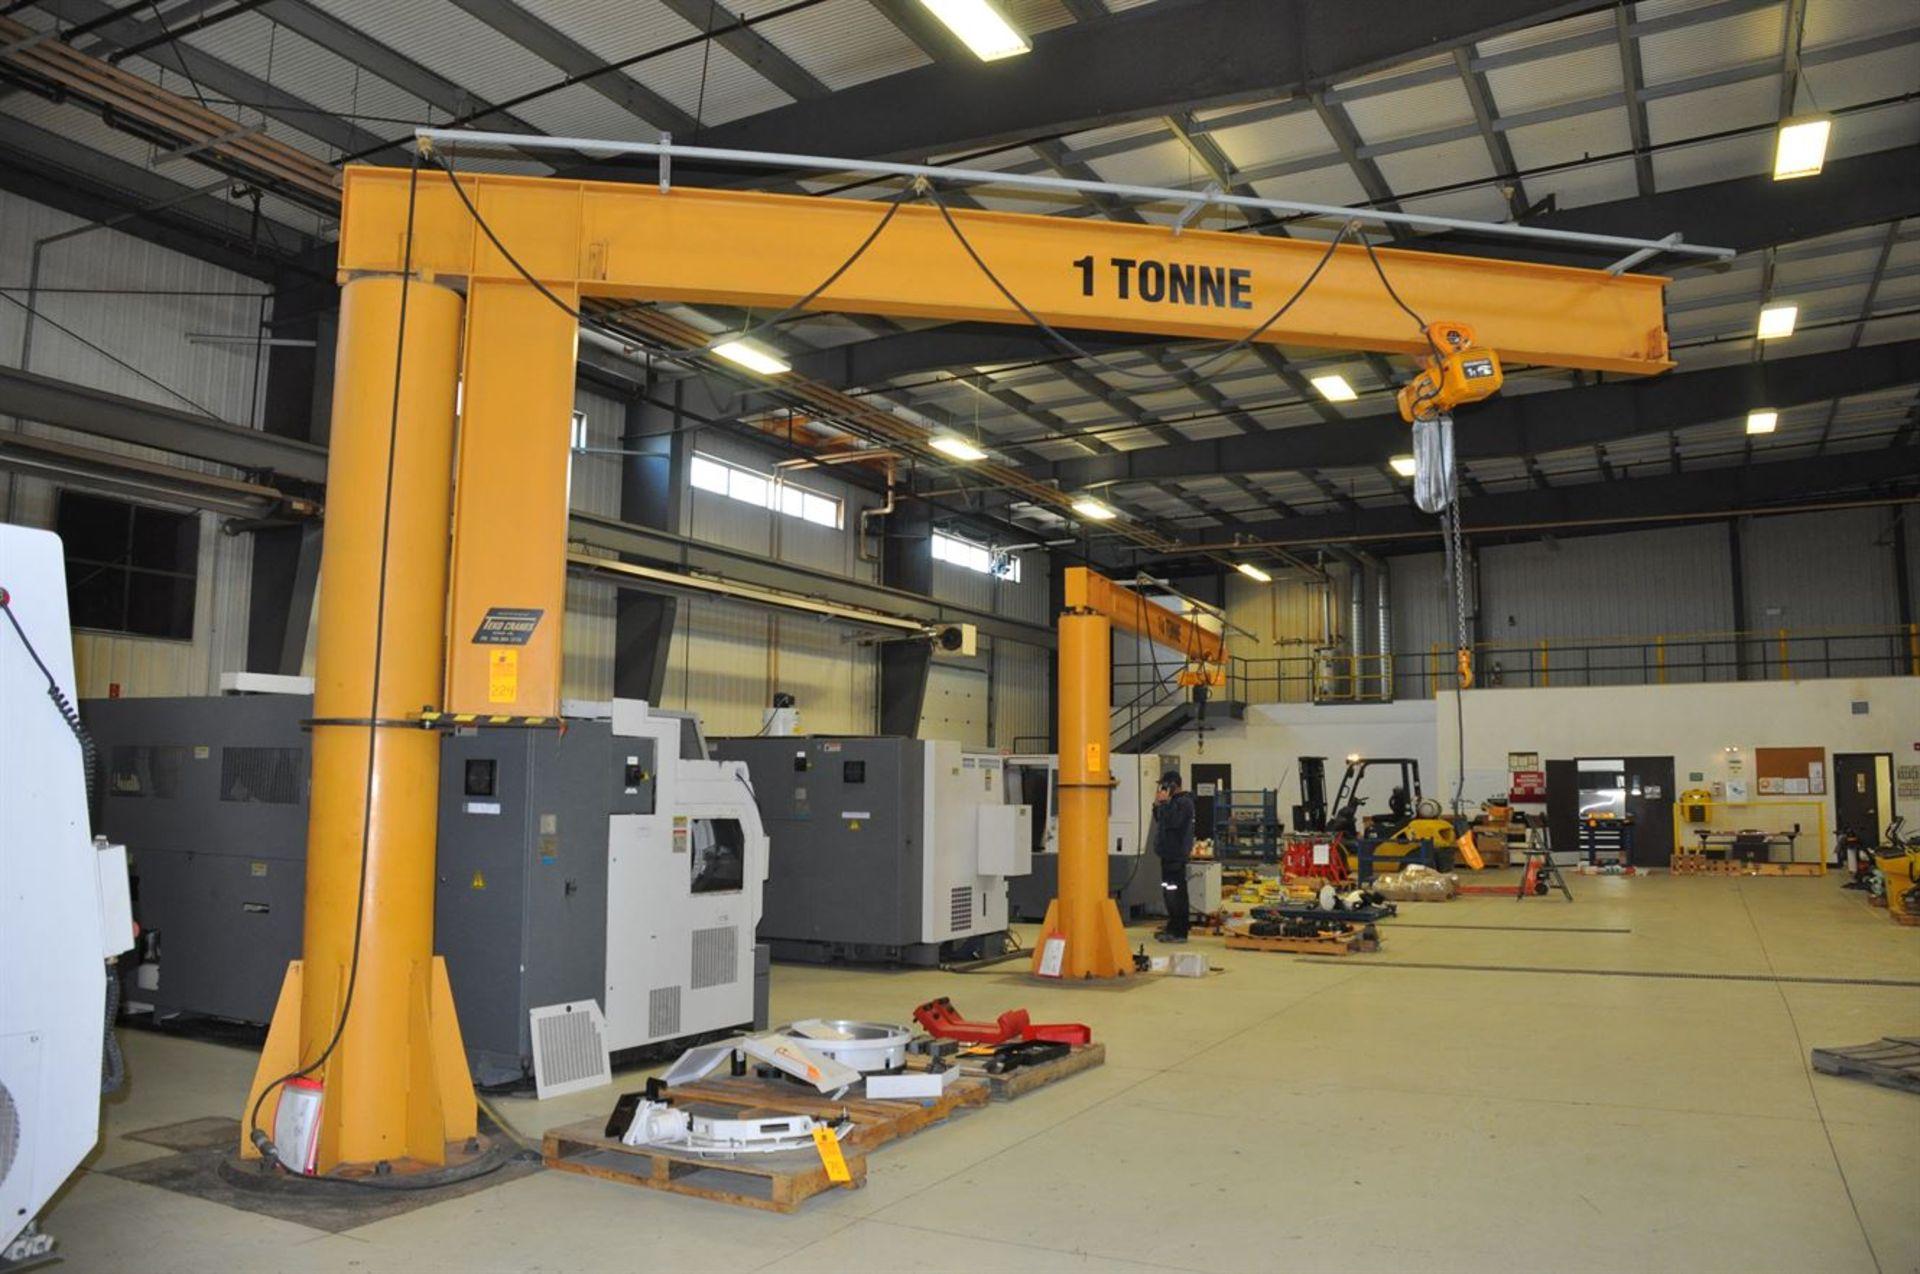 TEKO 1 Tonne Free Standing Jib Crane w/ KITO 1 Tonne Electric Chain Hoist